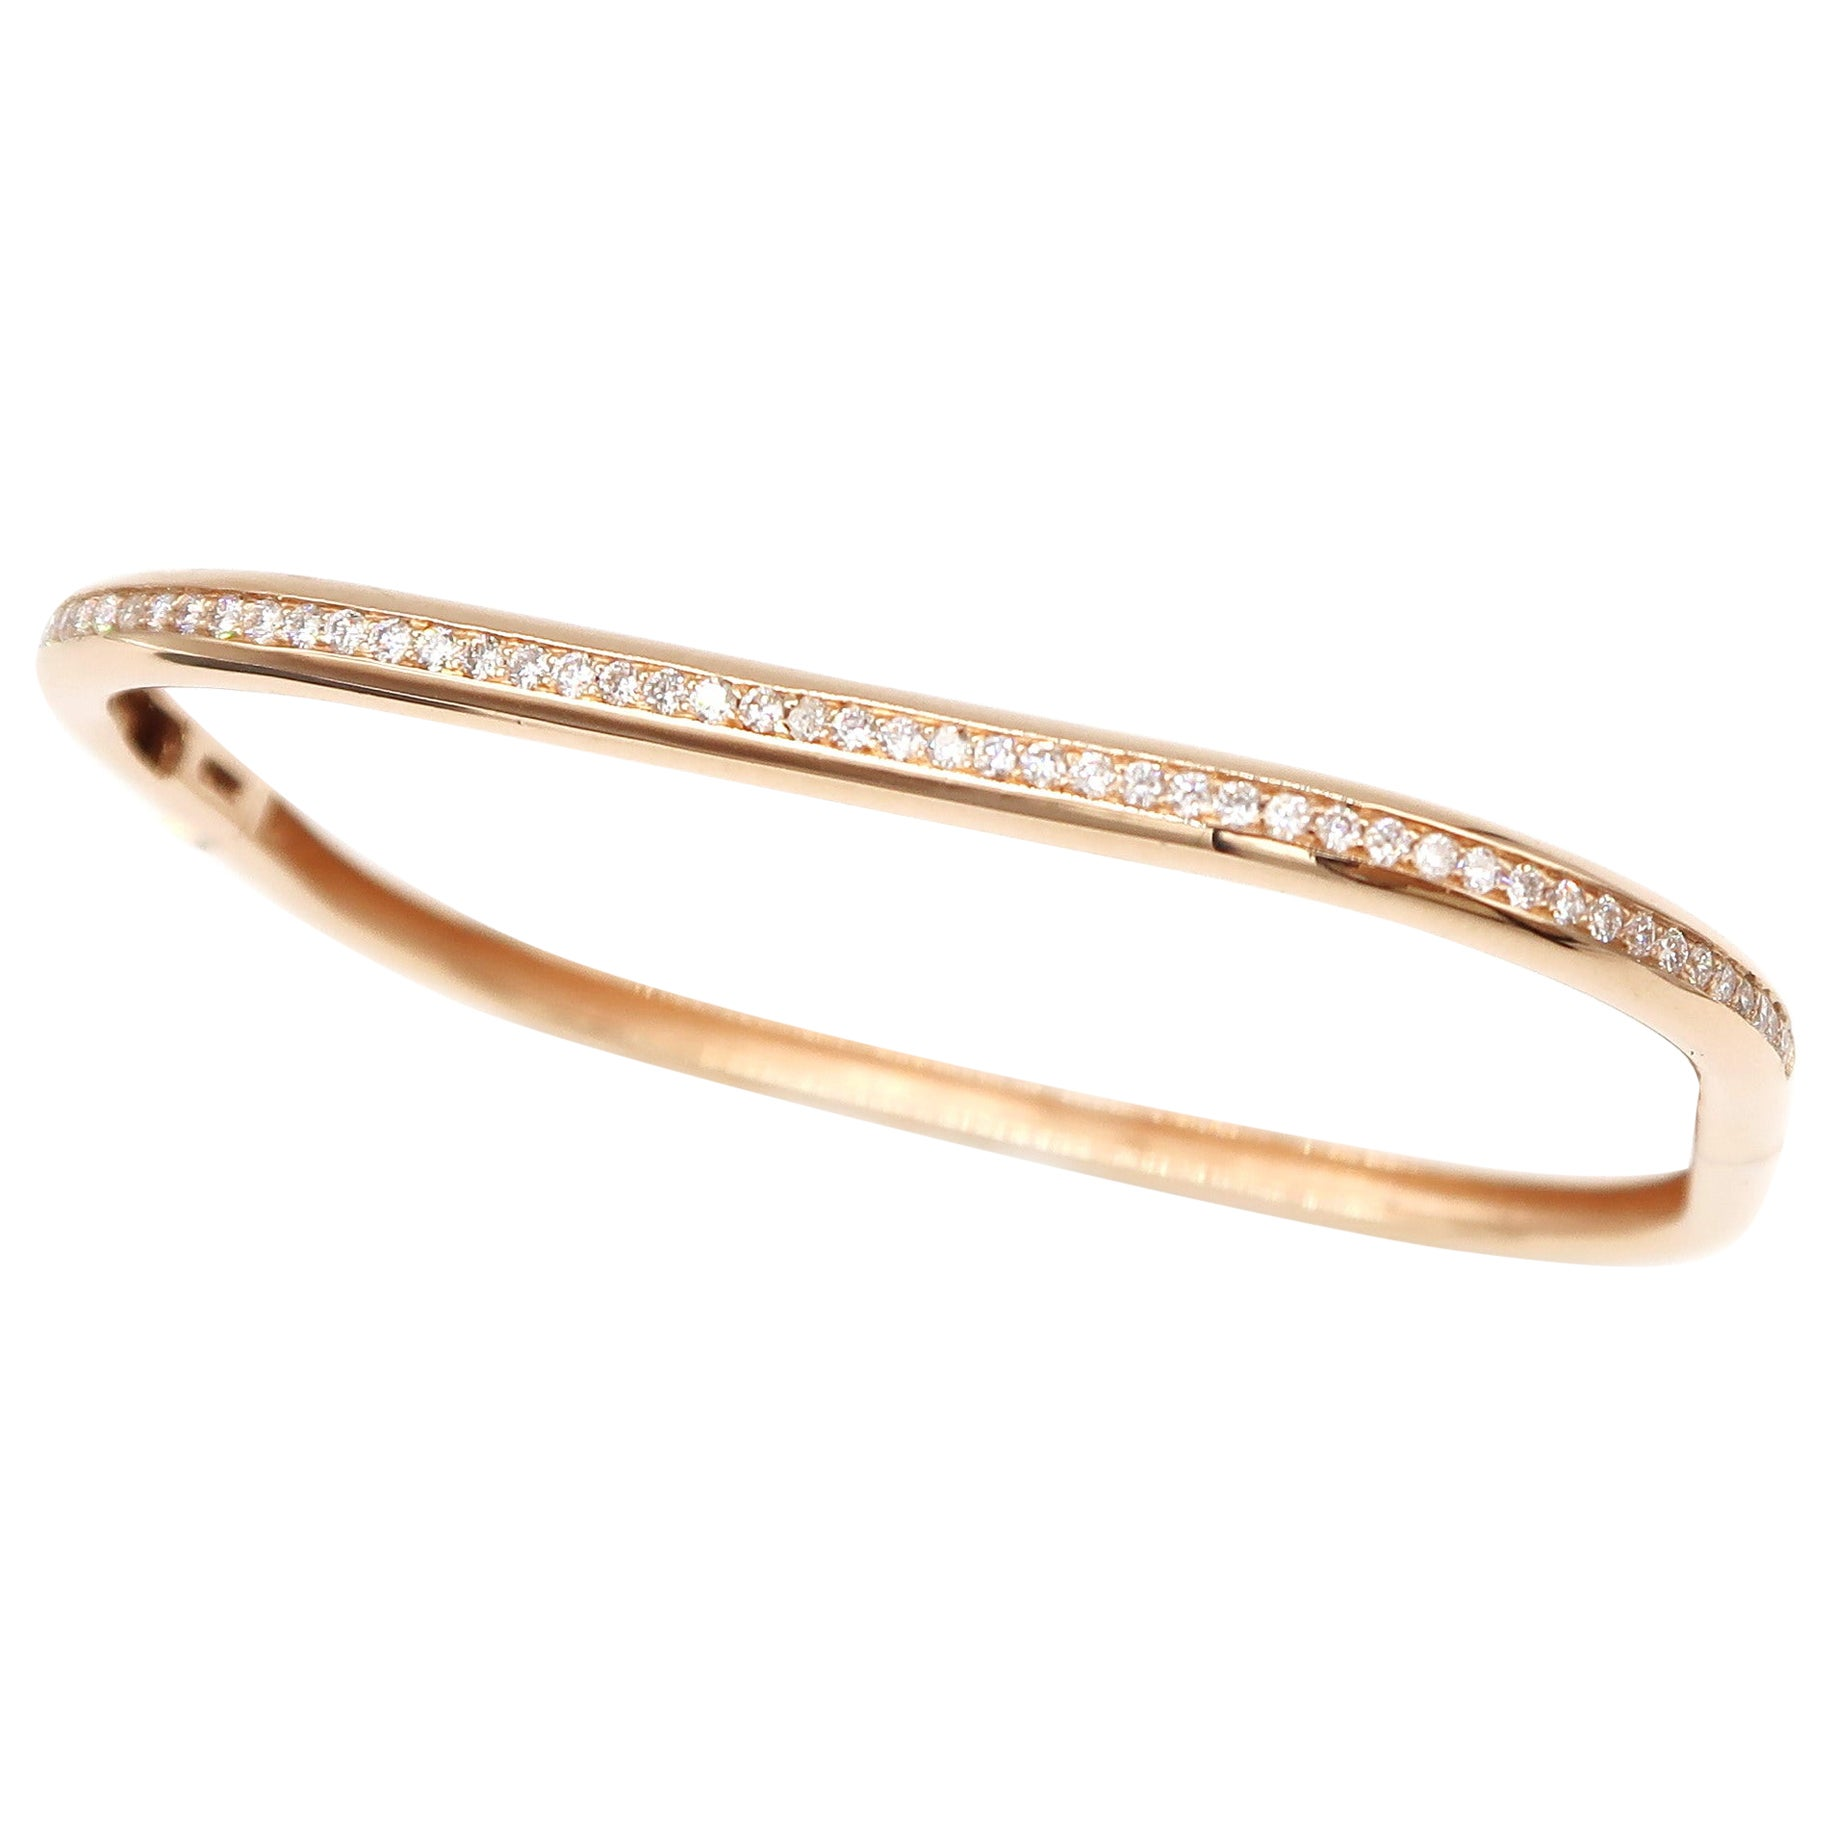 Diamond Rounded Rectangle Bangle in 18 Karat Rose Gold